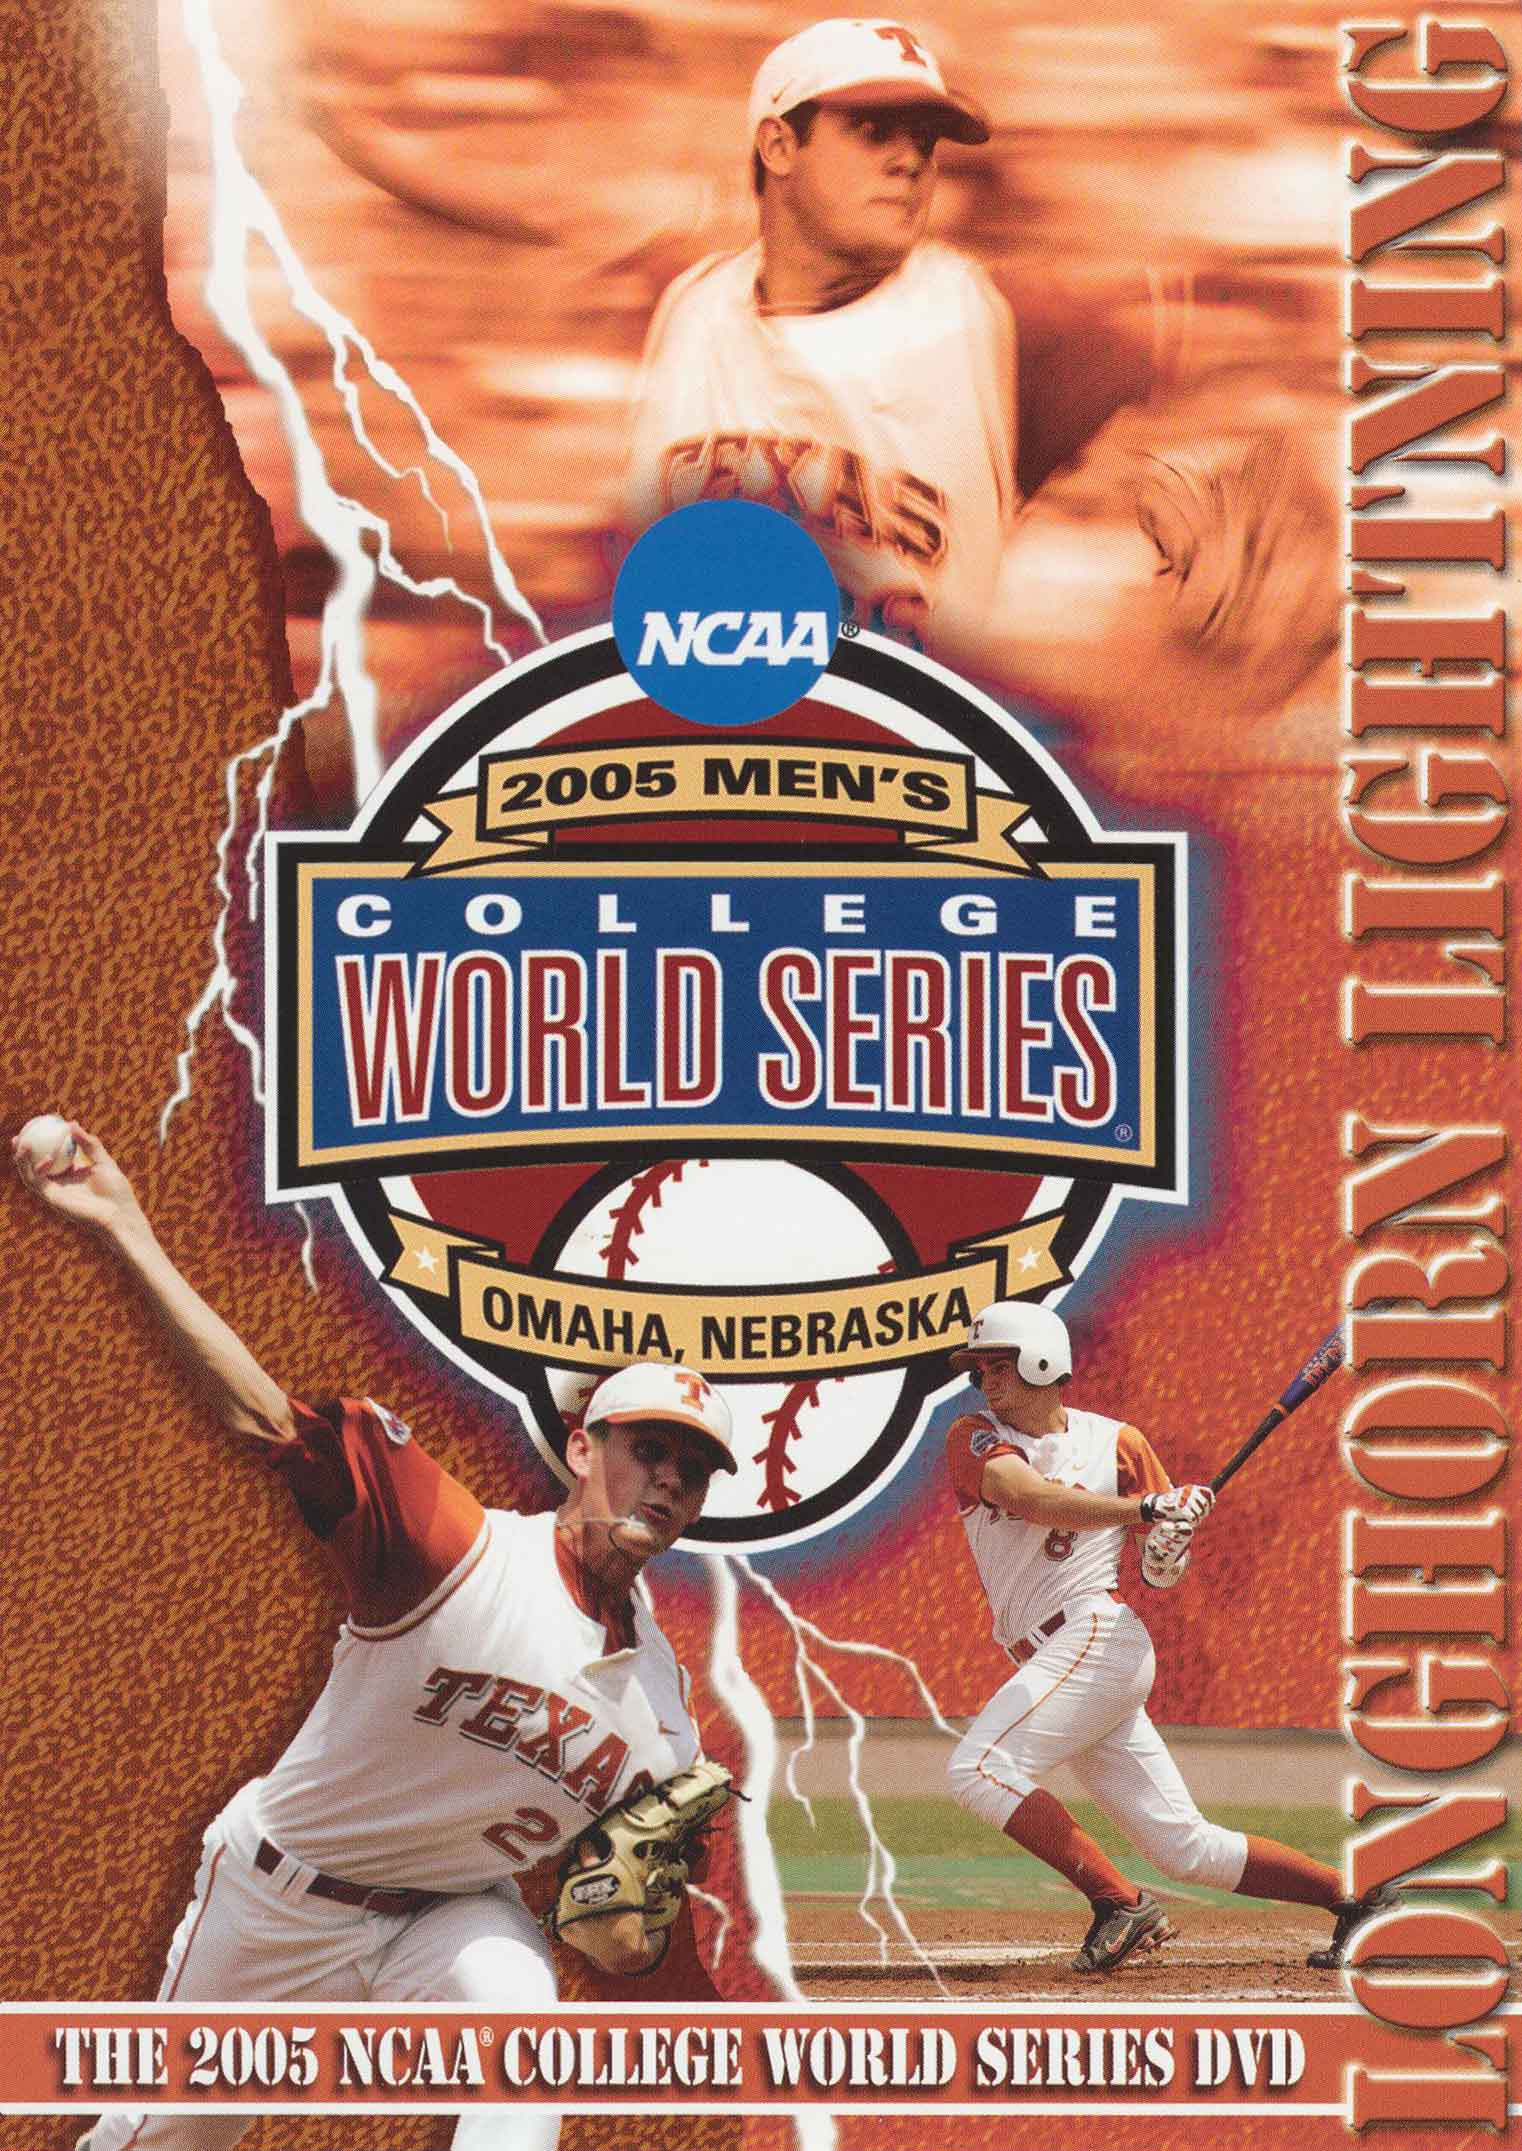 2005 NCAA Men's College World Series